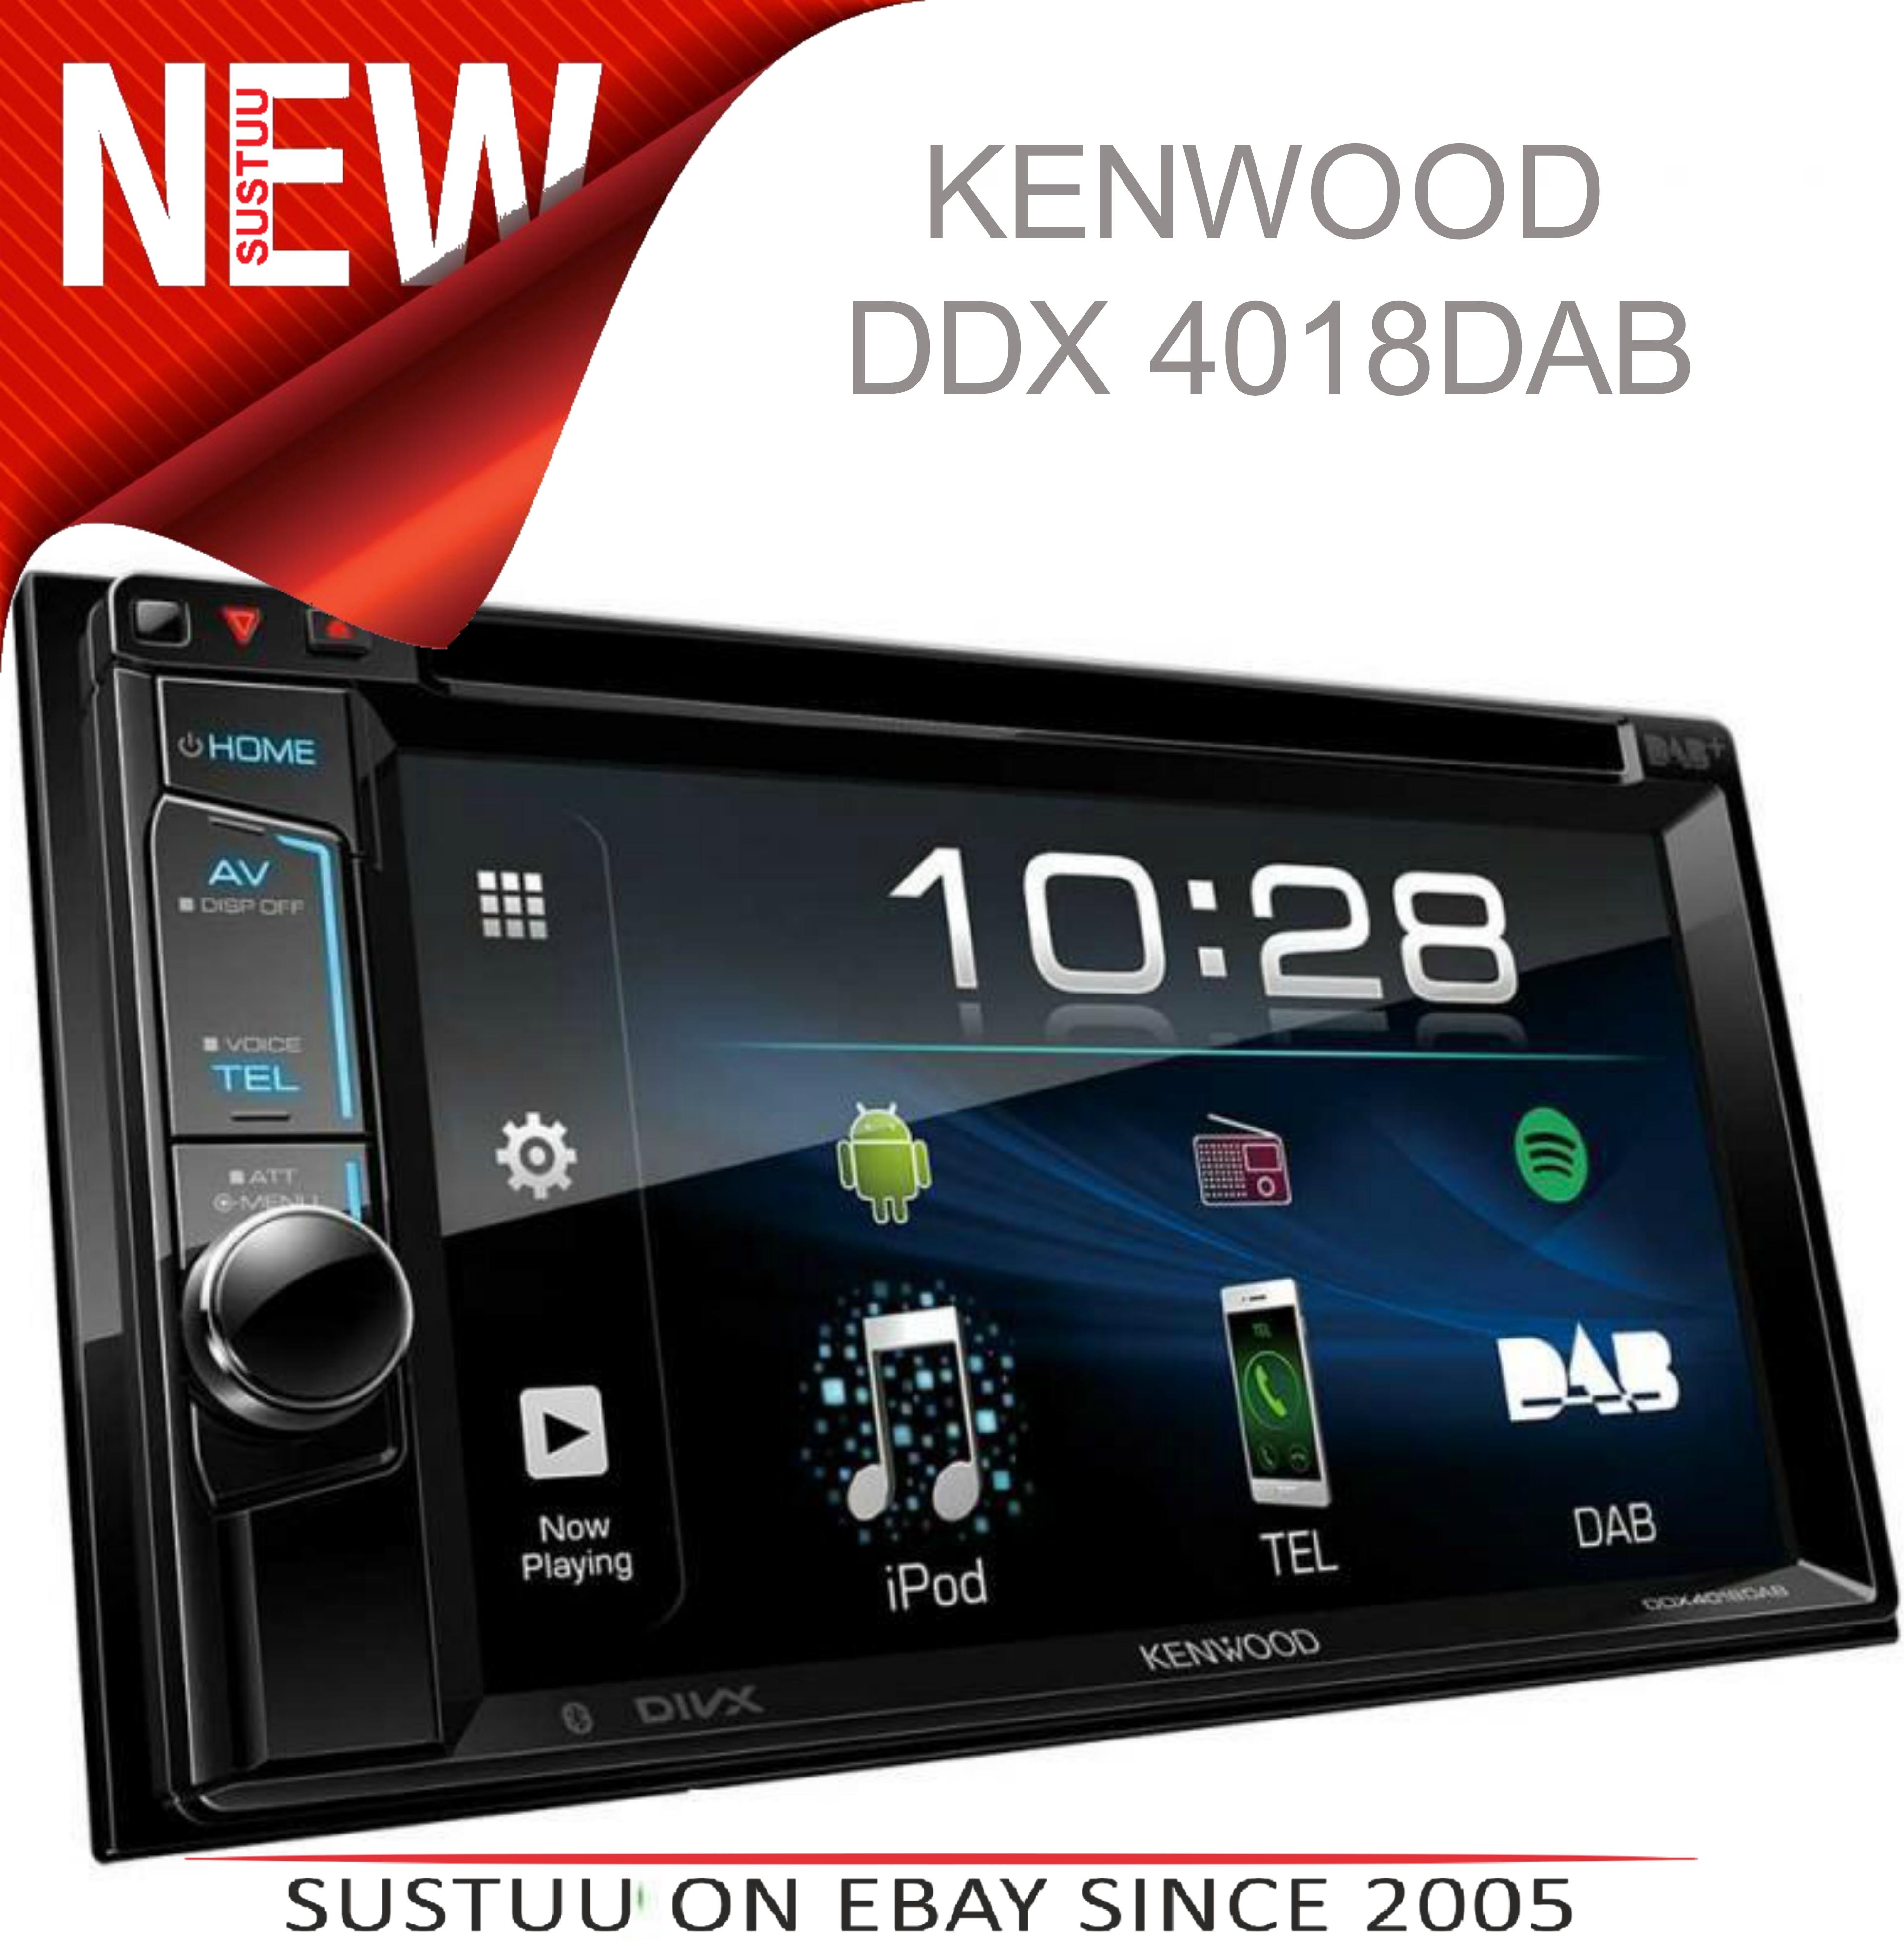 "Kenwood DDX 4018DAB Double Din 6.2"" Car Stereo DVD/Bluetooth/Usb & DAB + Radio"